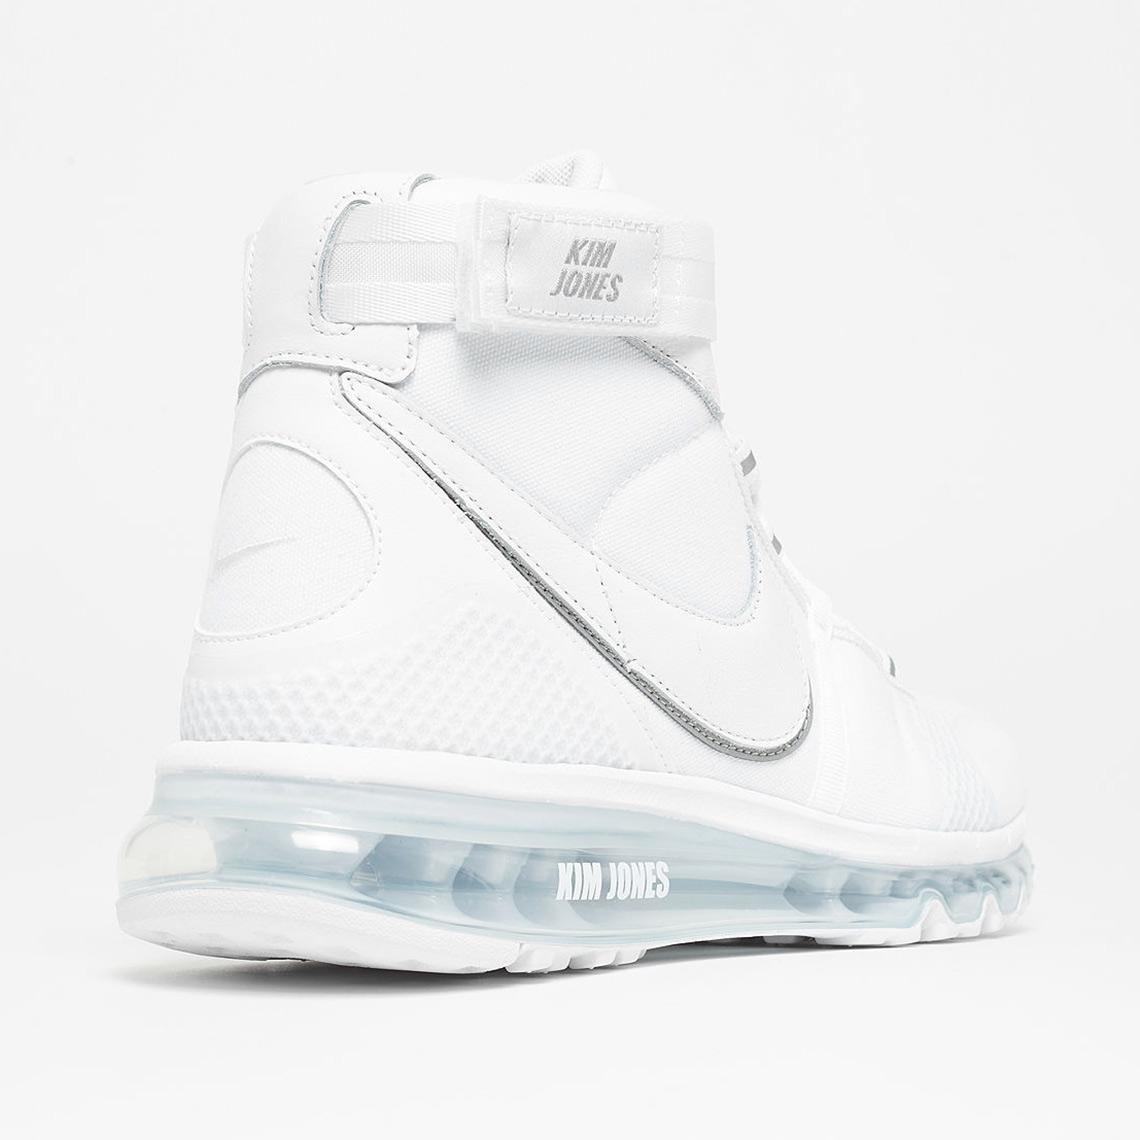 Kim Jones Nike Air Max 360 Hi Top Shoe Release Info